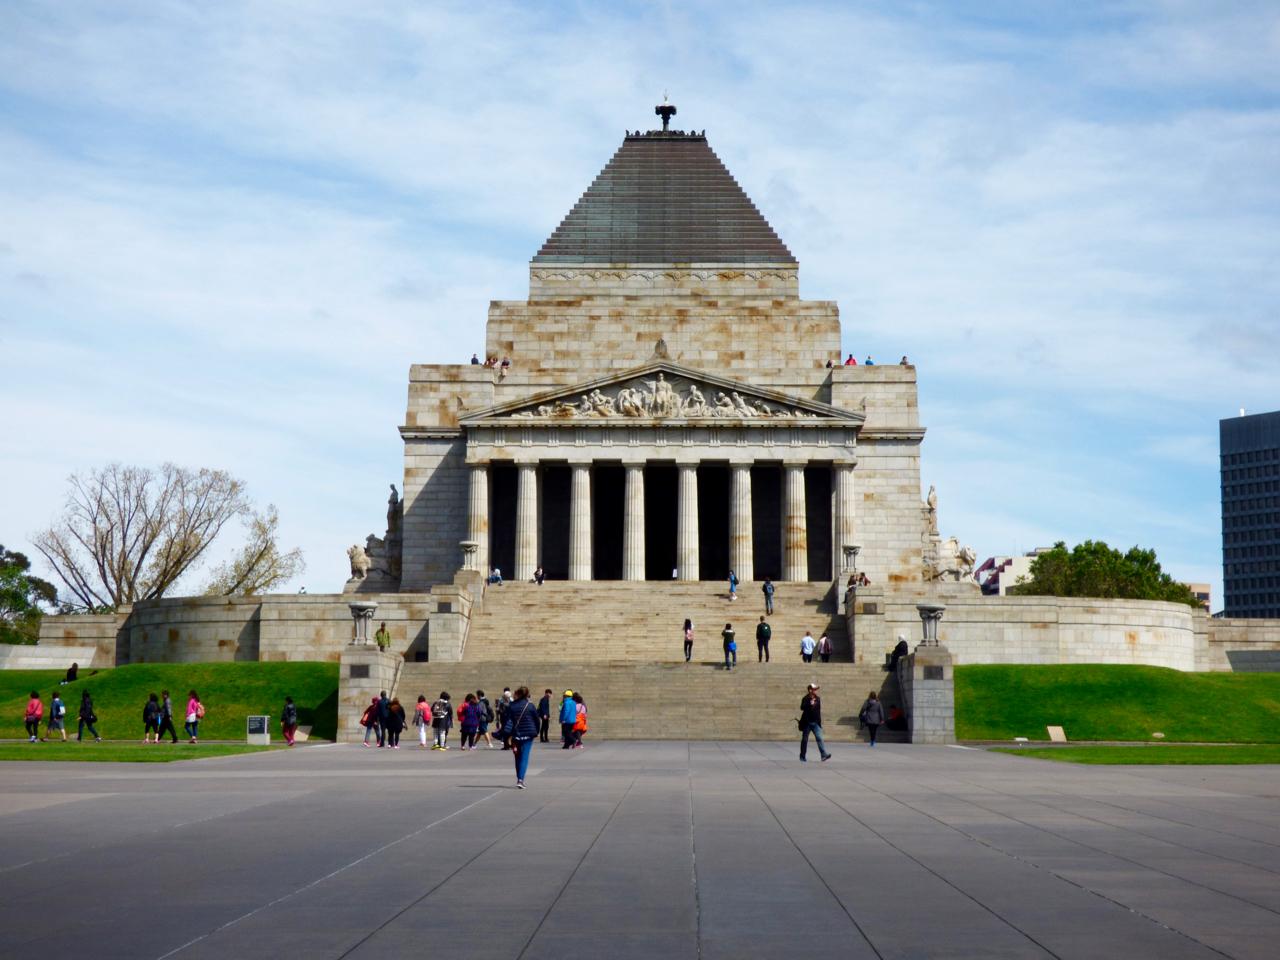 Shrine of Remembrance Melbourne, Australia